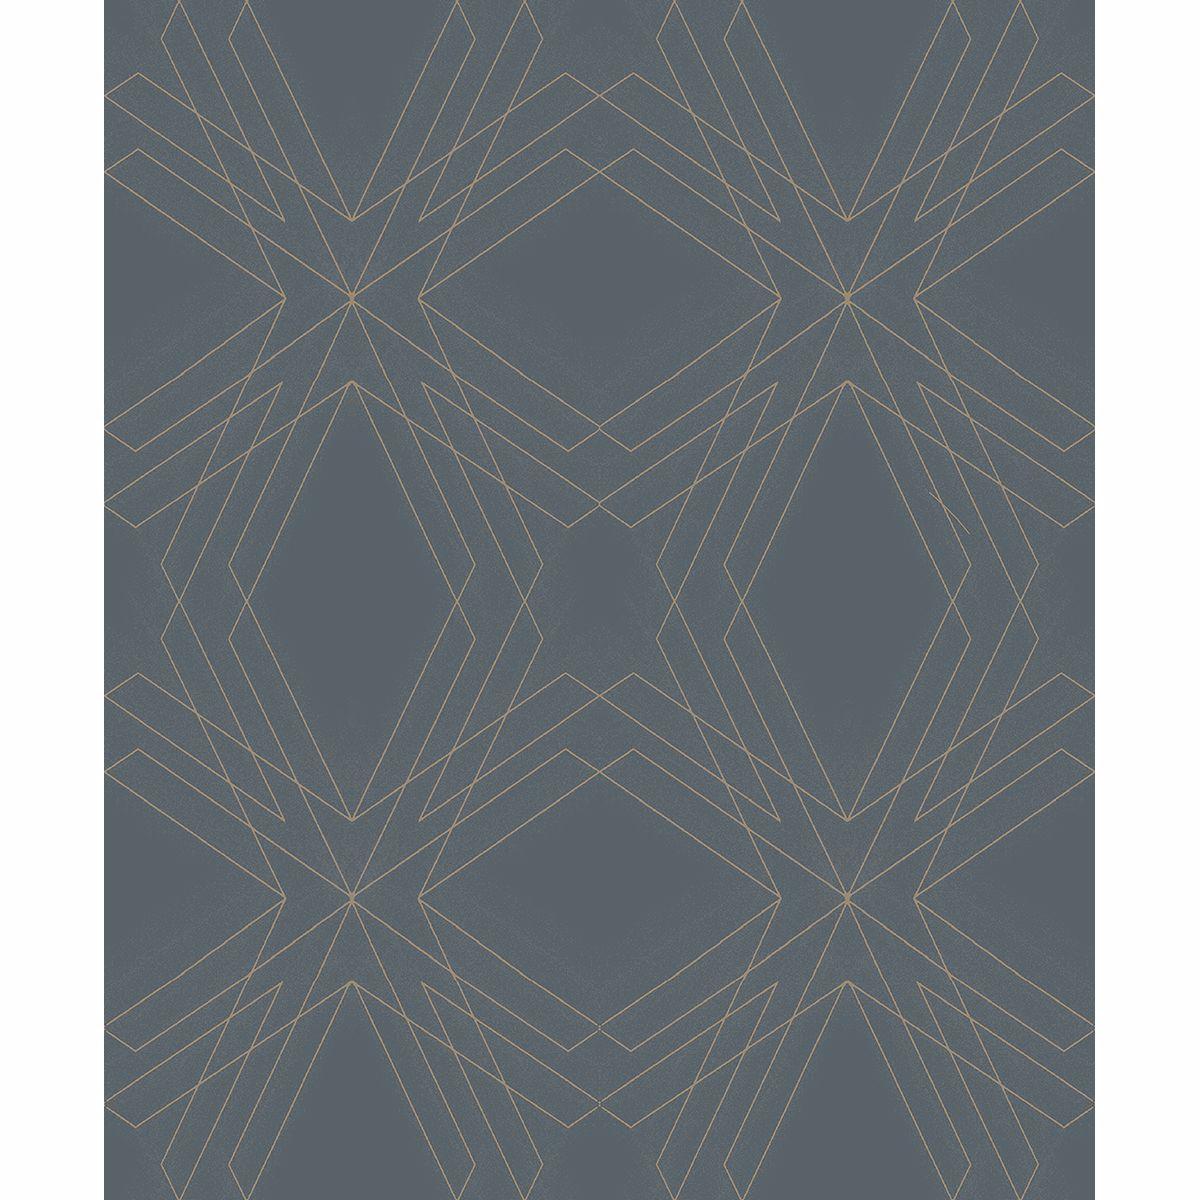 2908 87107 Relativity Charcoal Geometric Wallpaper By